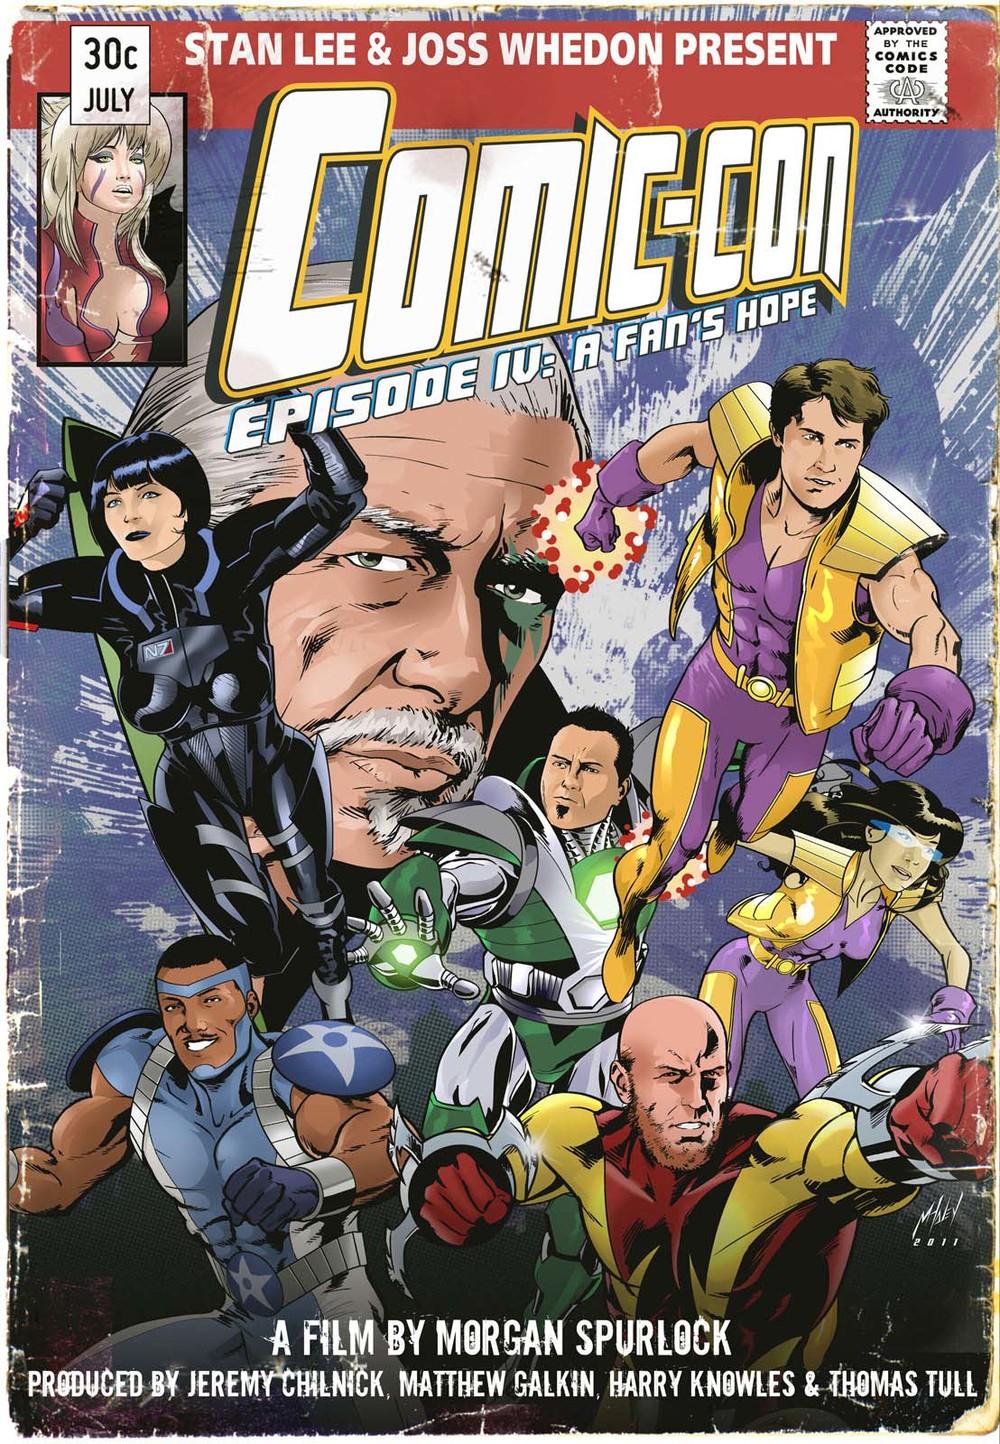 ComicConEp4.jpg